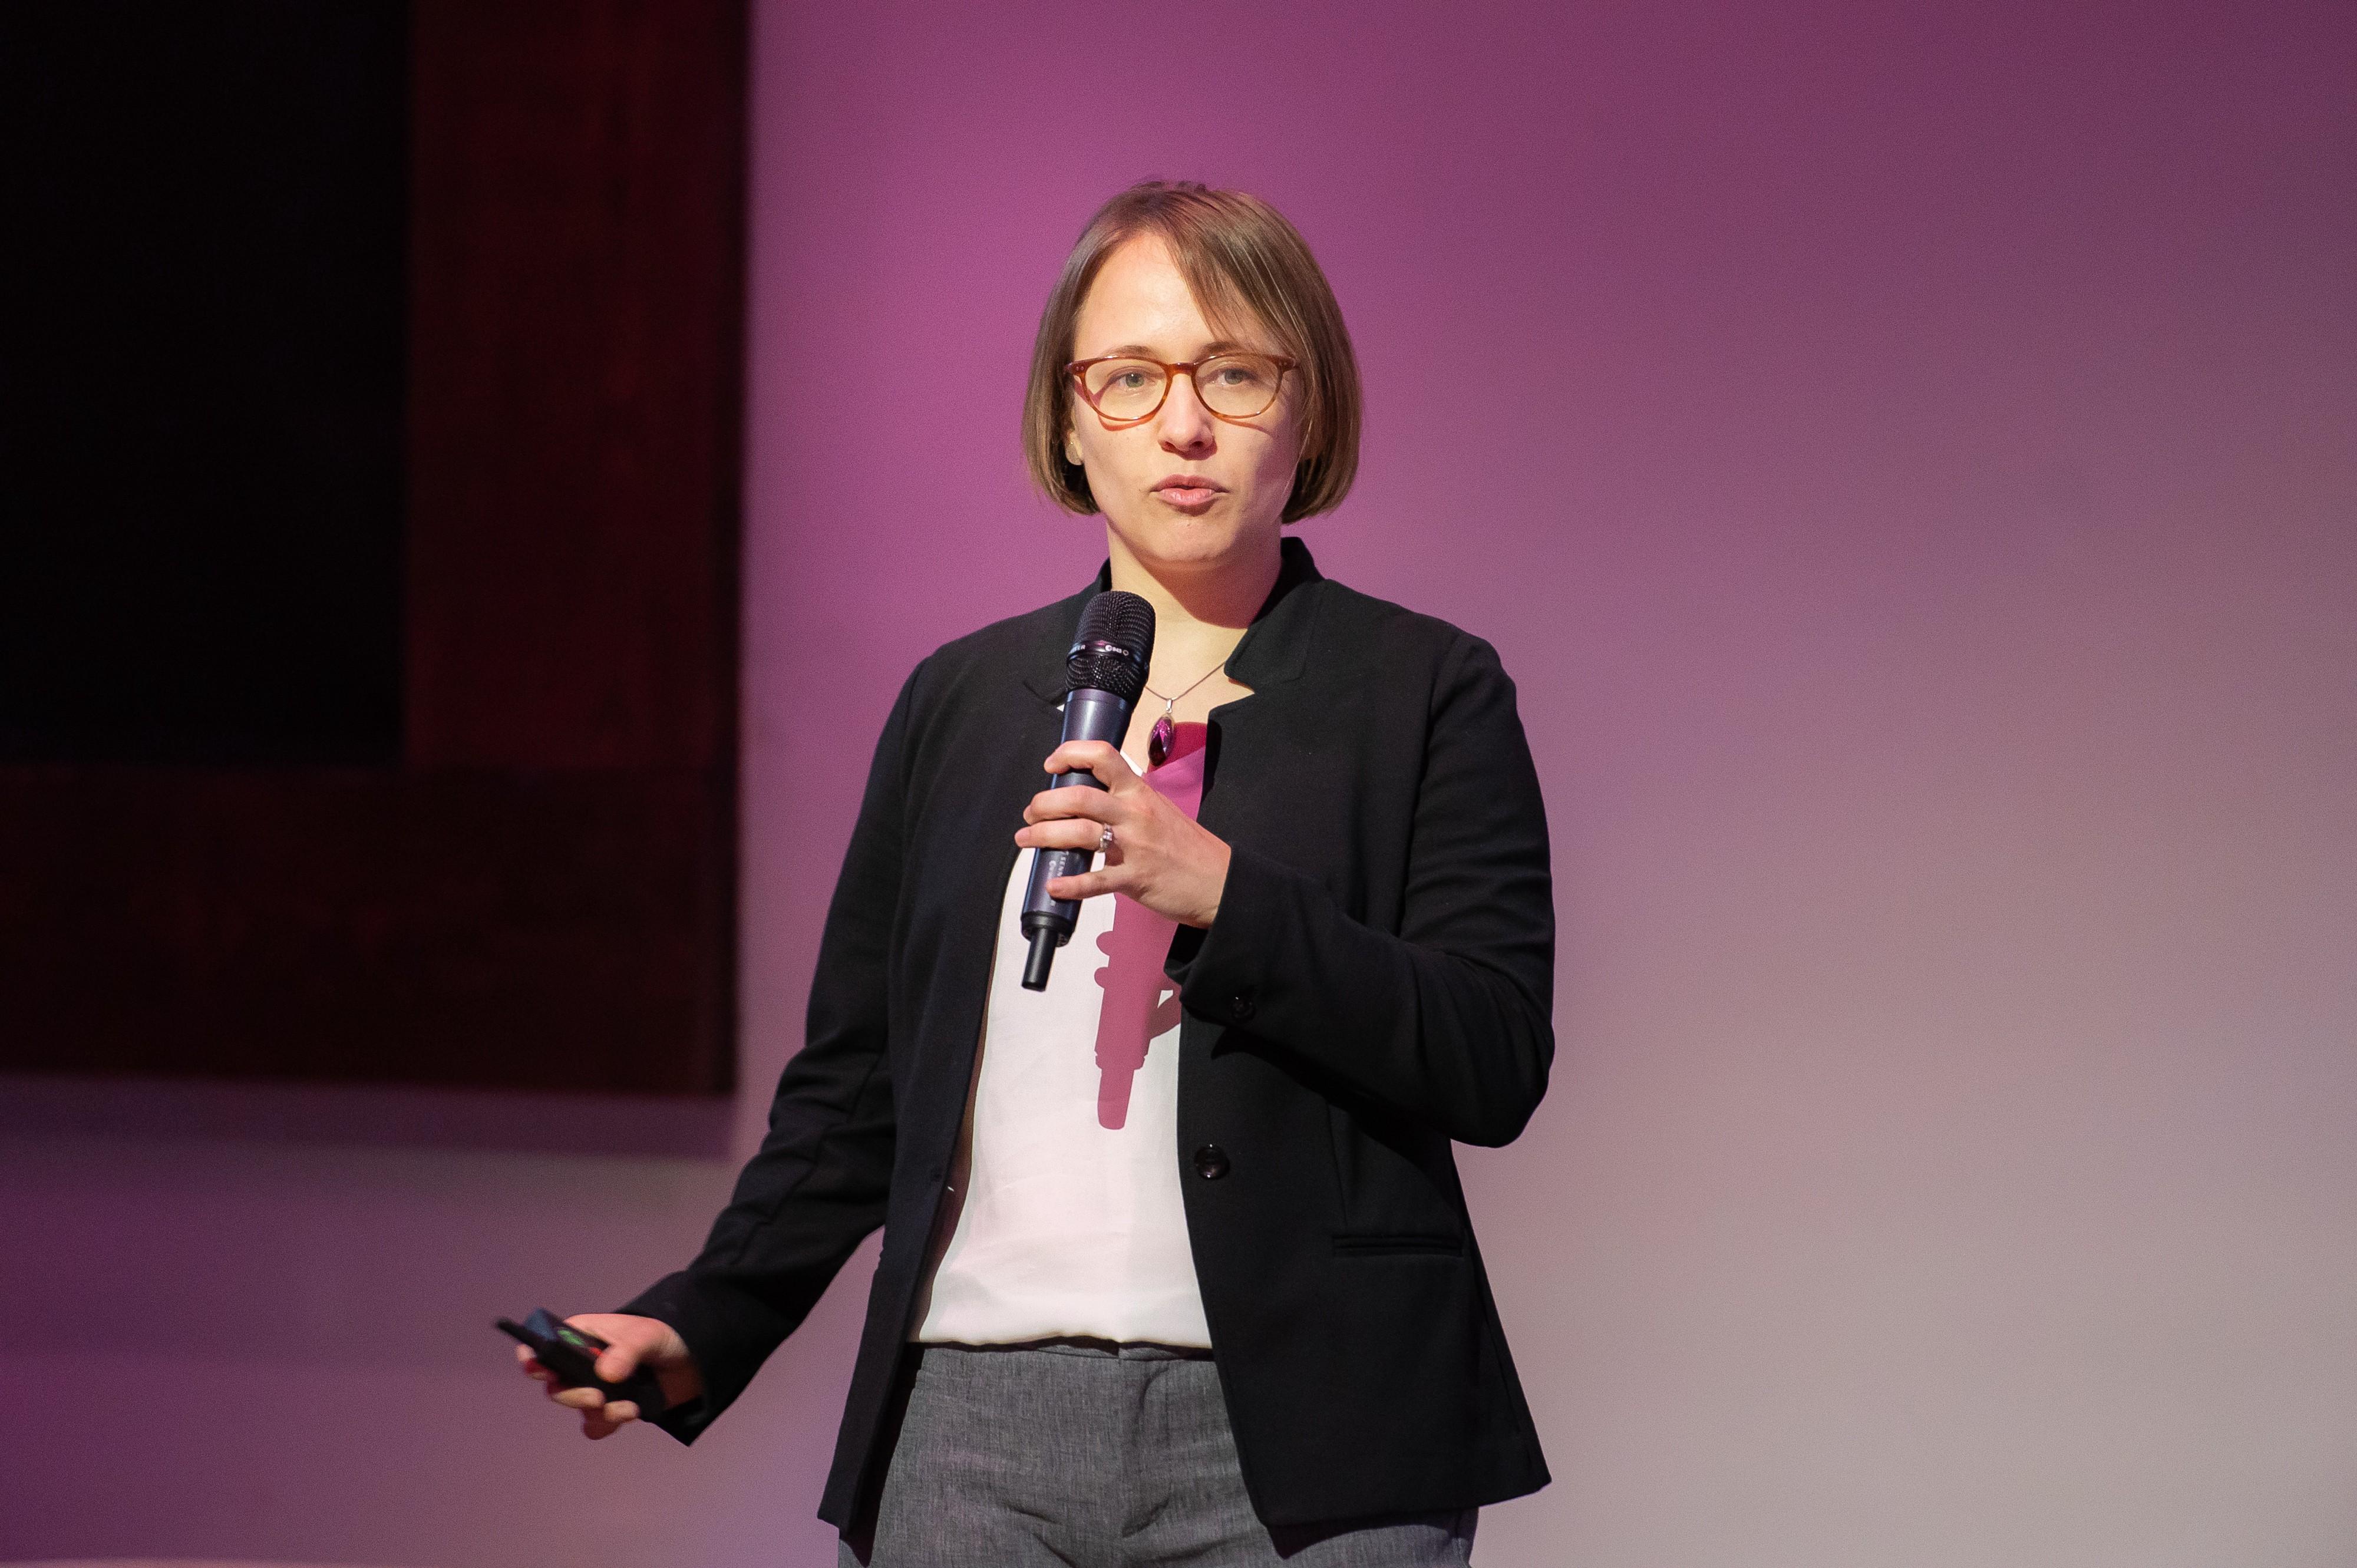 Anna Graseck, MD presenting Penn Medicine's ROIanalysis